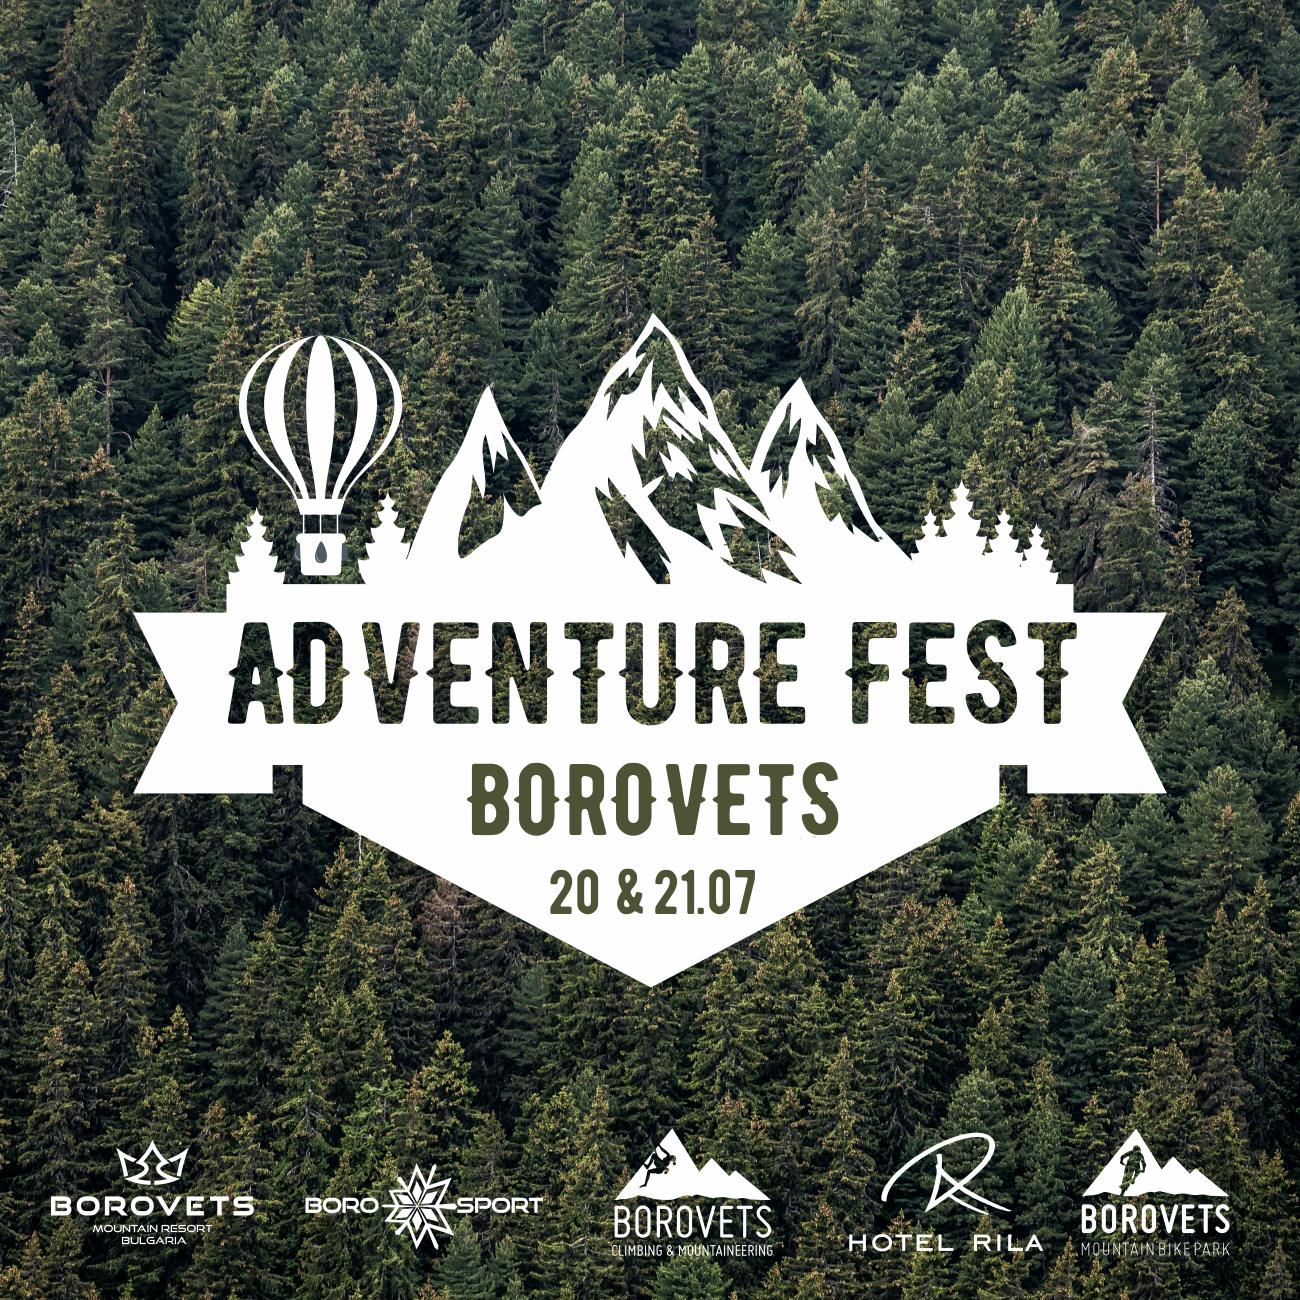 Borovets Adventure Fest